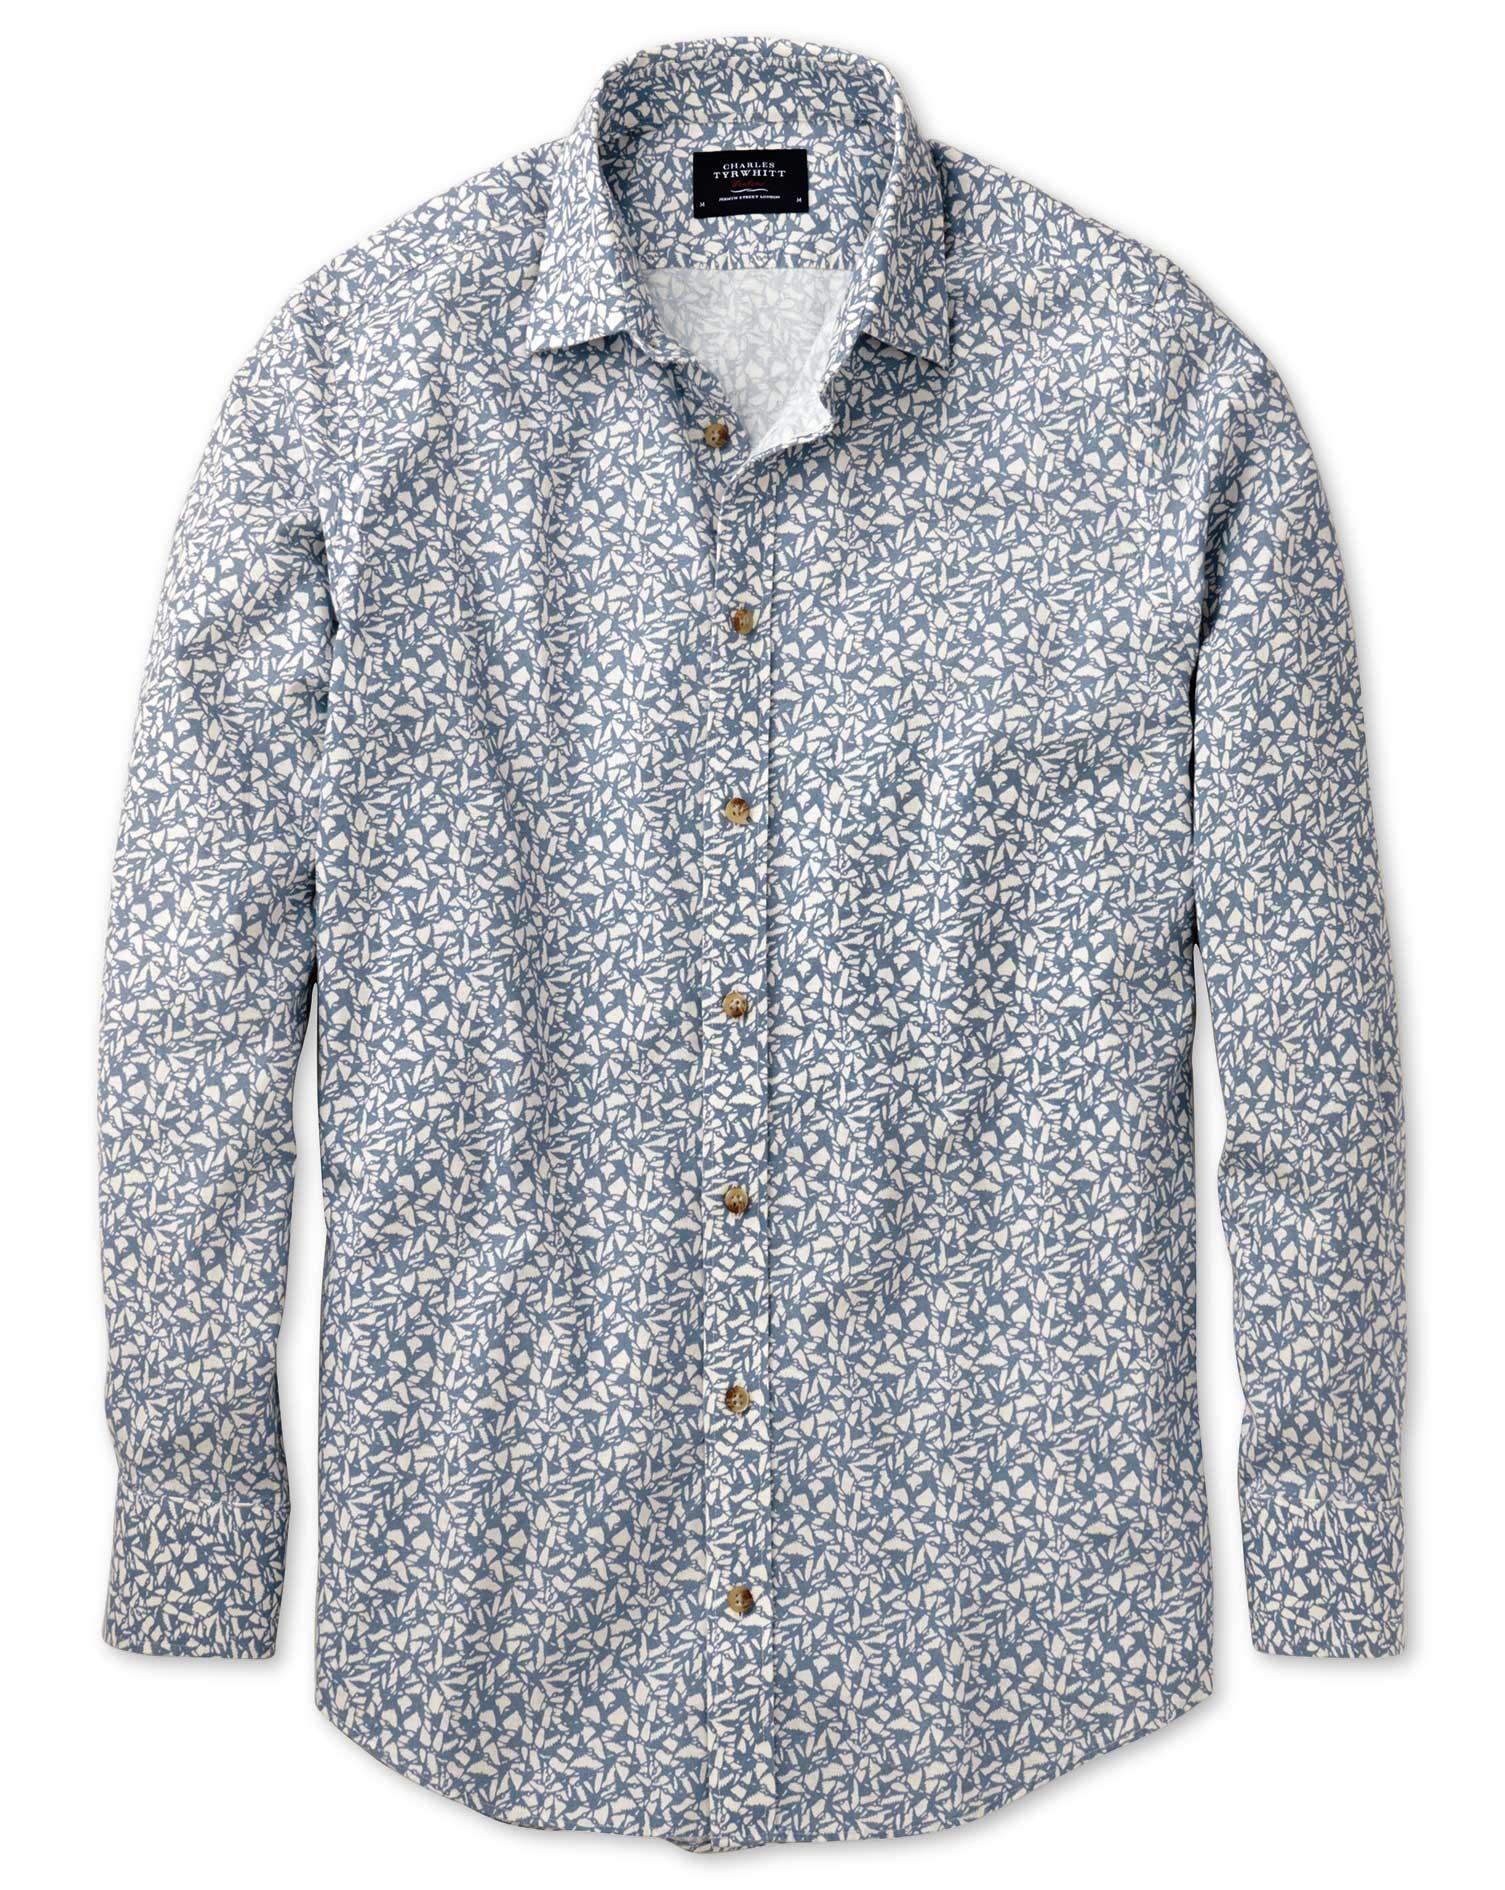 Classic Fit Sky Blue Leaf Print Shirt Single Cuff Size Small by Charles Tyrwhitt